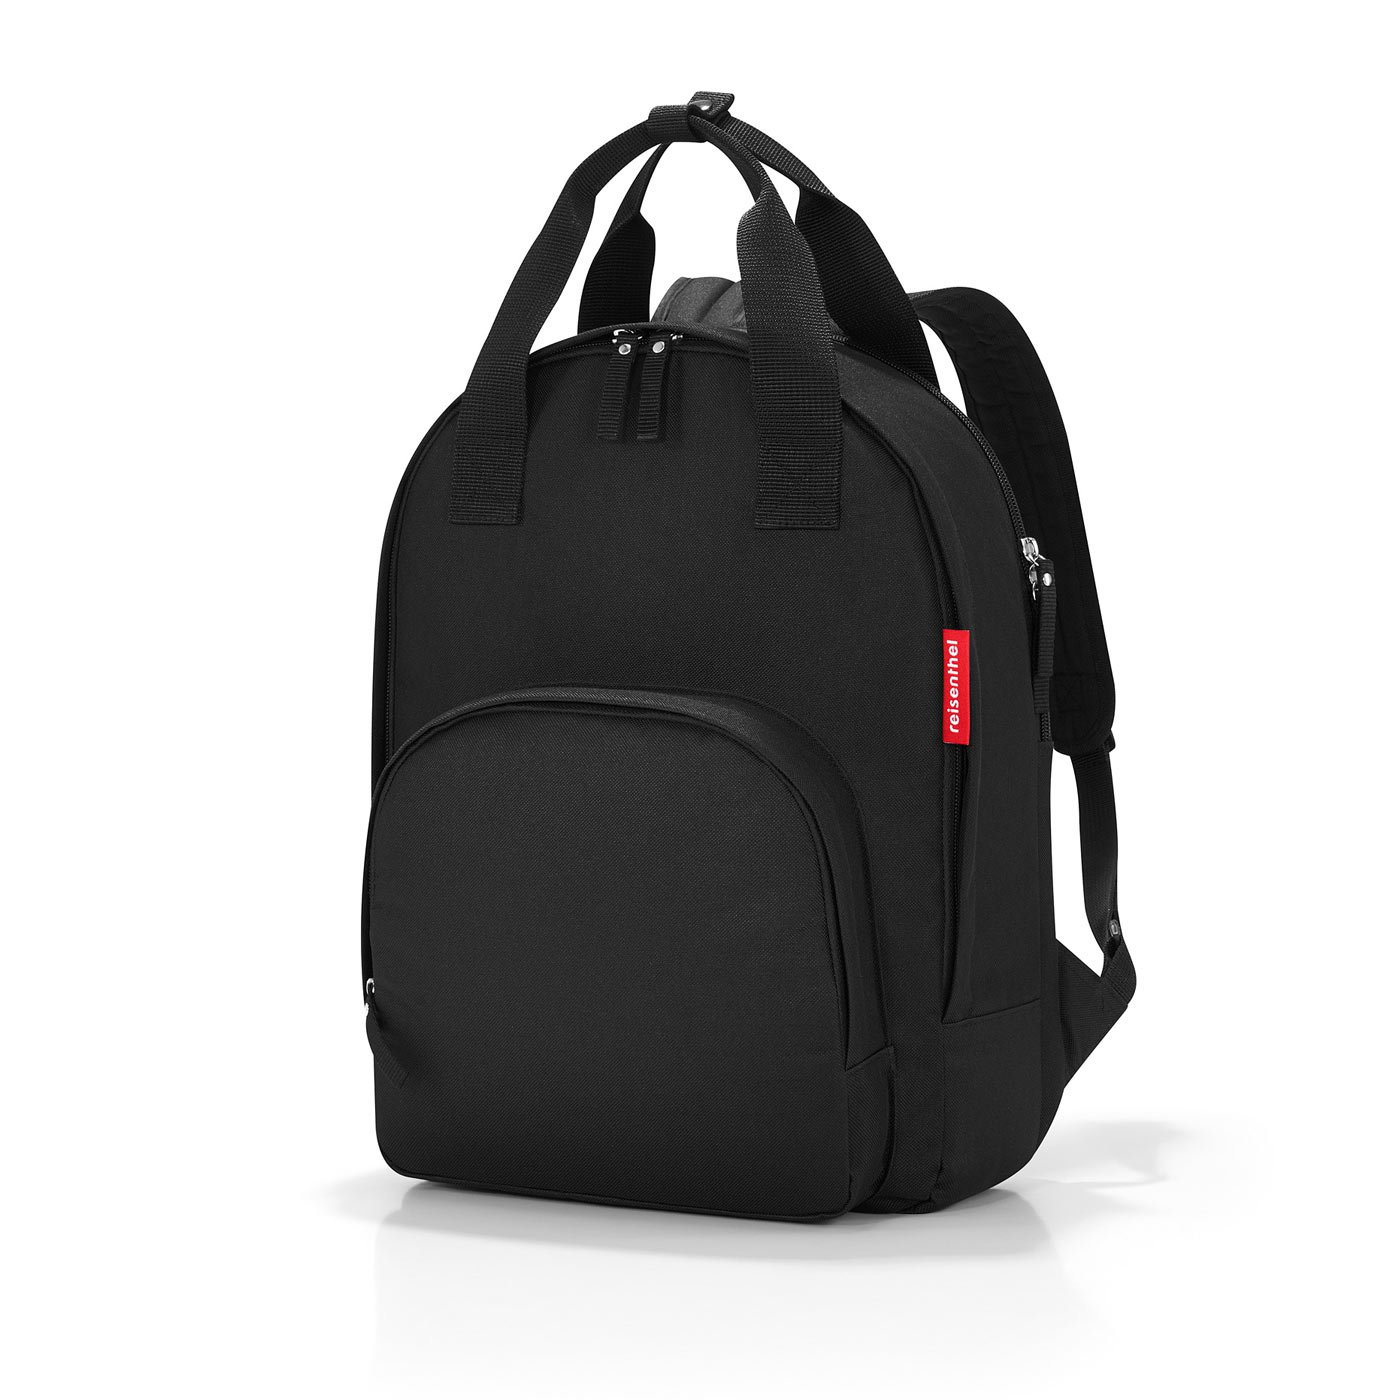 a9166200151 Easyfitbag 15 l JU7003 black